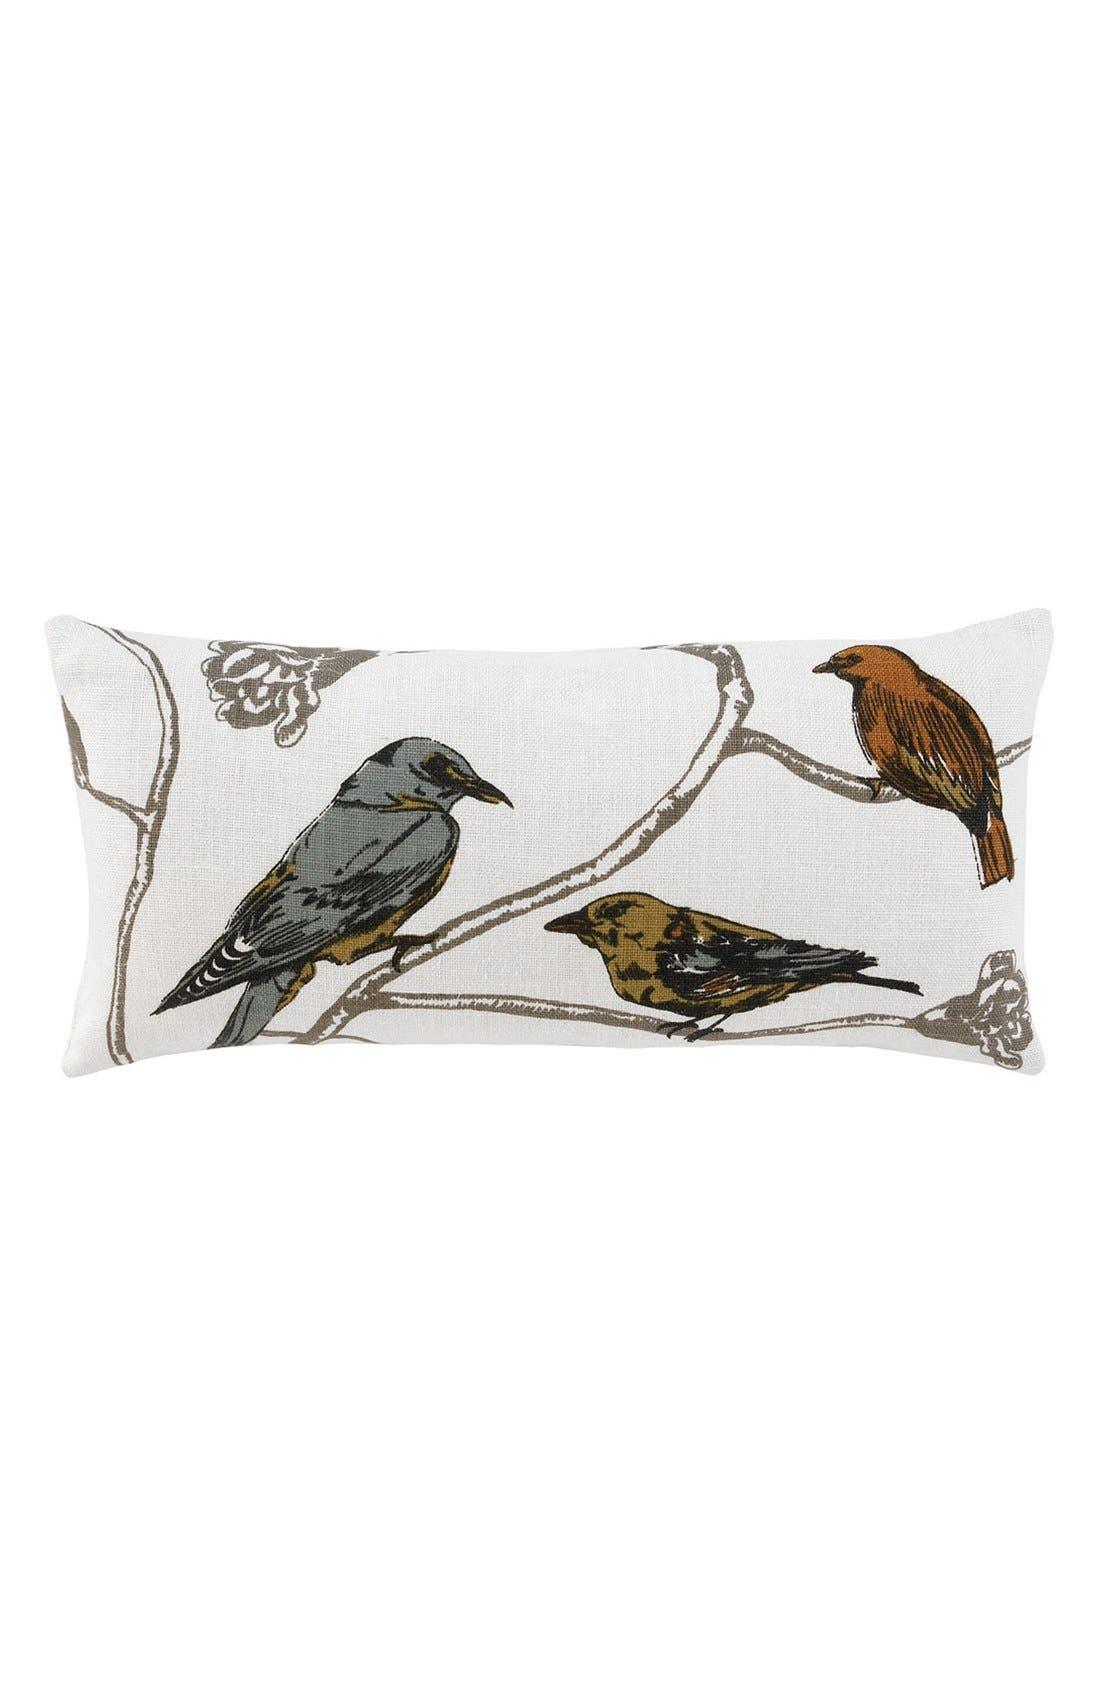 Main Image - DwellStudio 'Chinoiserie' Decorative Pillow